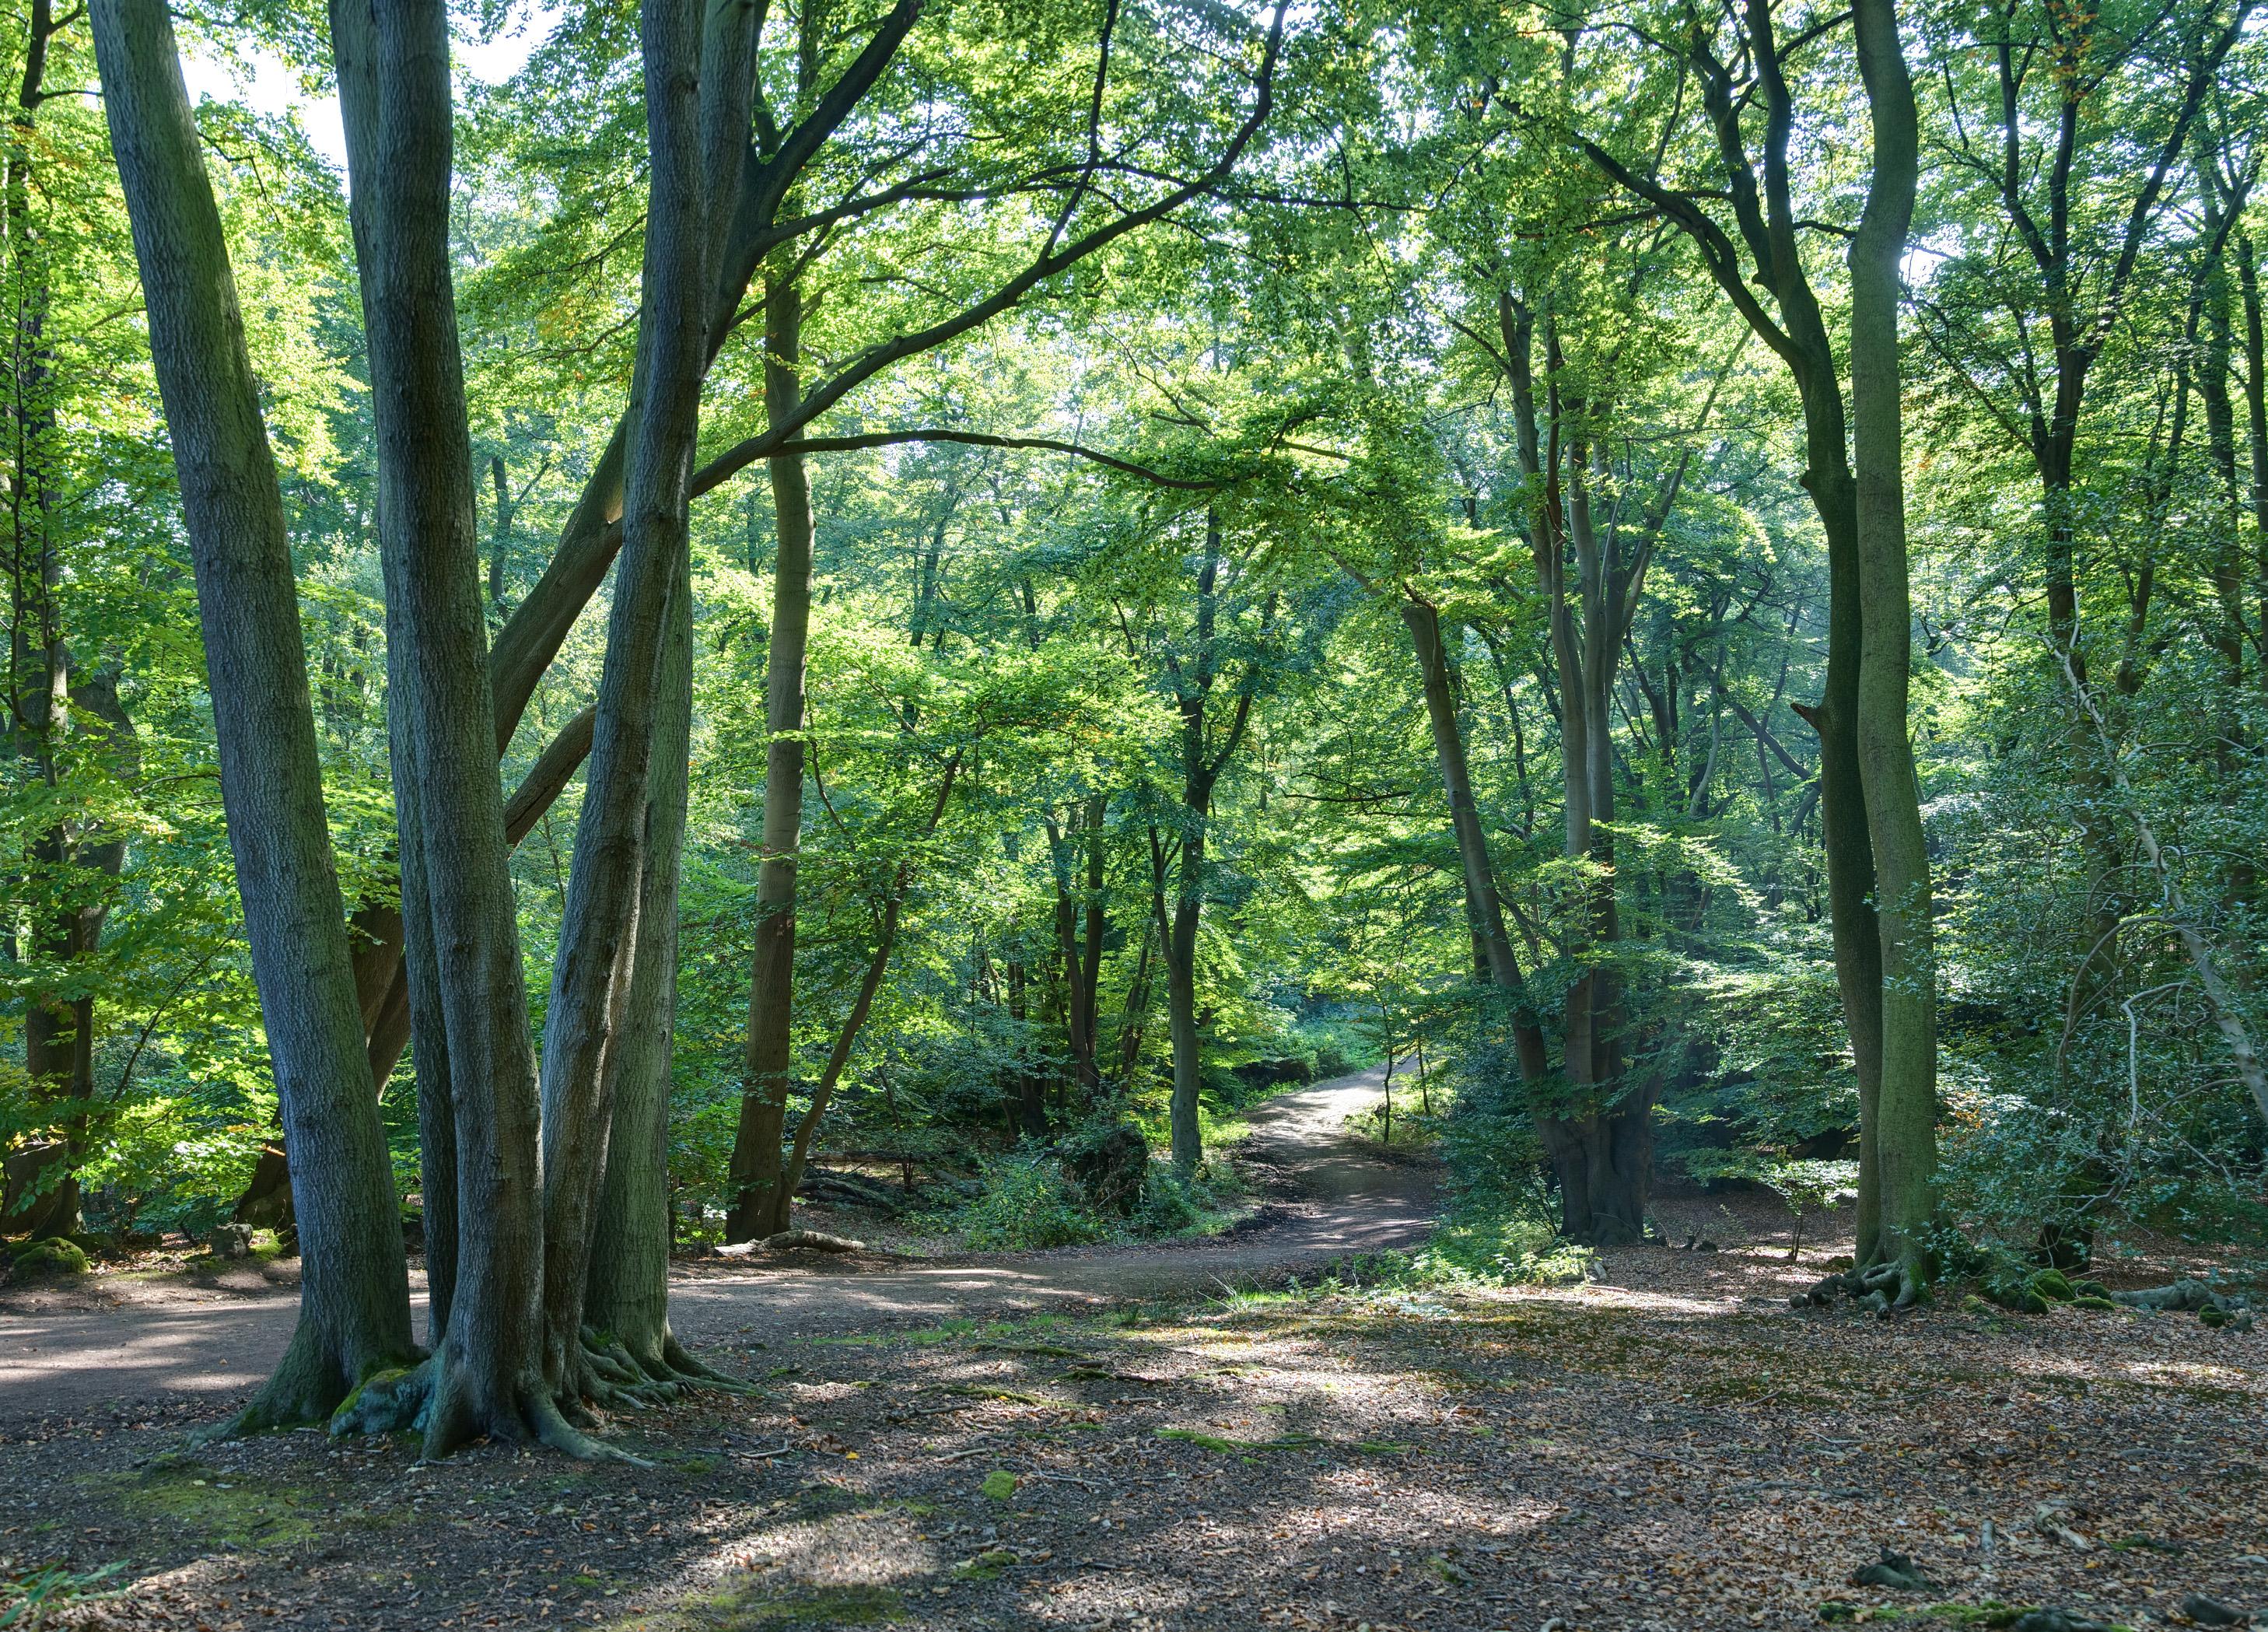 https://i0.wp.com/upload.wikimedia.org/wikipedia/commons/f/f6/Epping_Forest_Centenary_Walk_2_-_Sept_2008.jpg